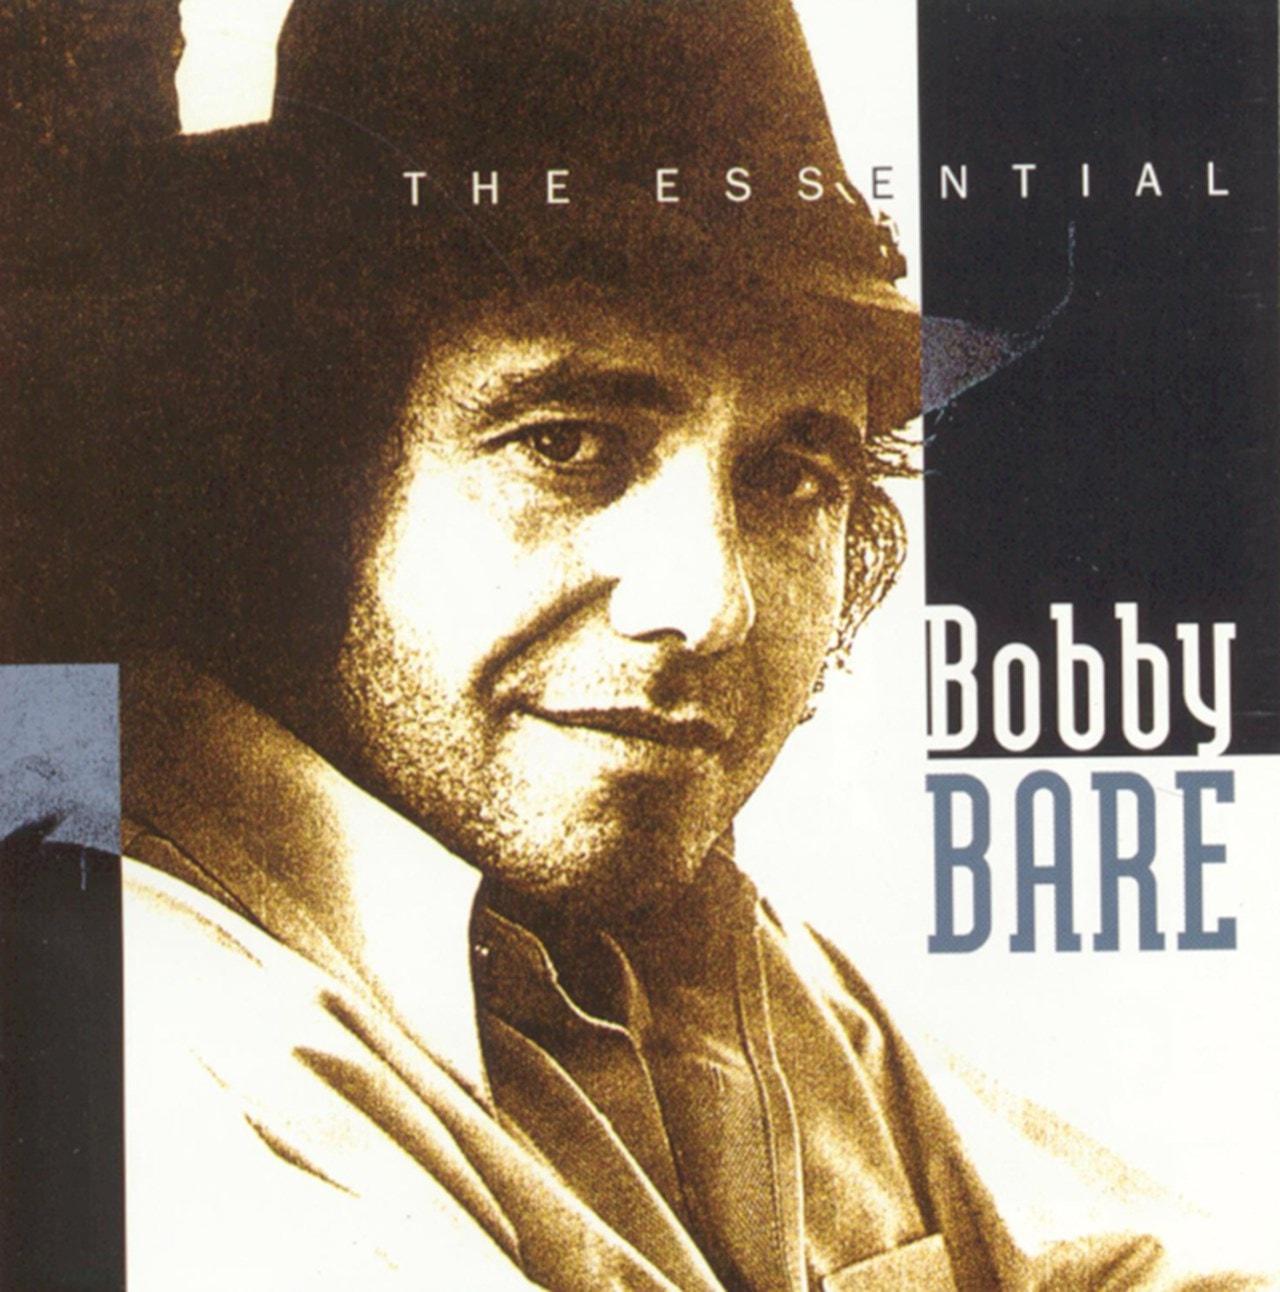 The Essential Bobby Bare - 1